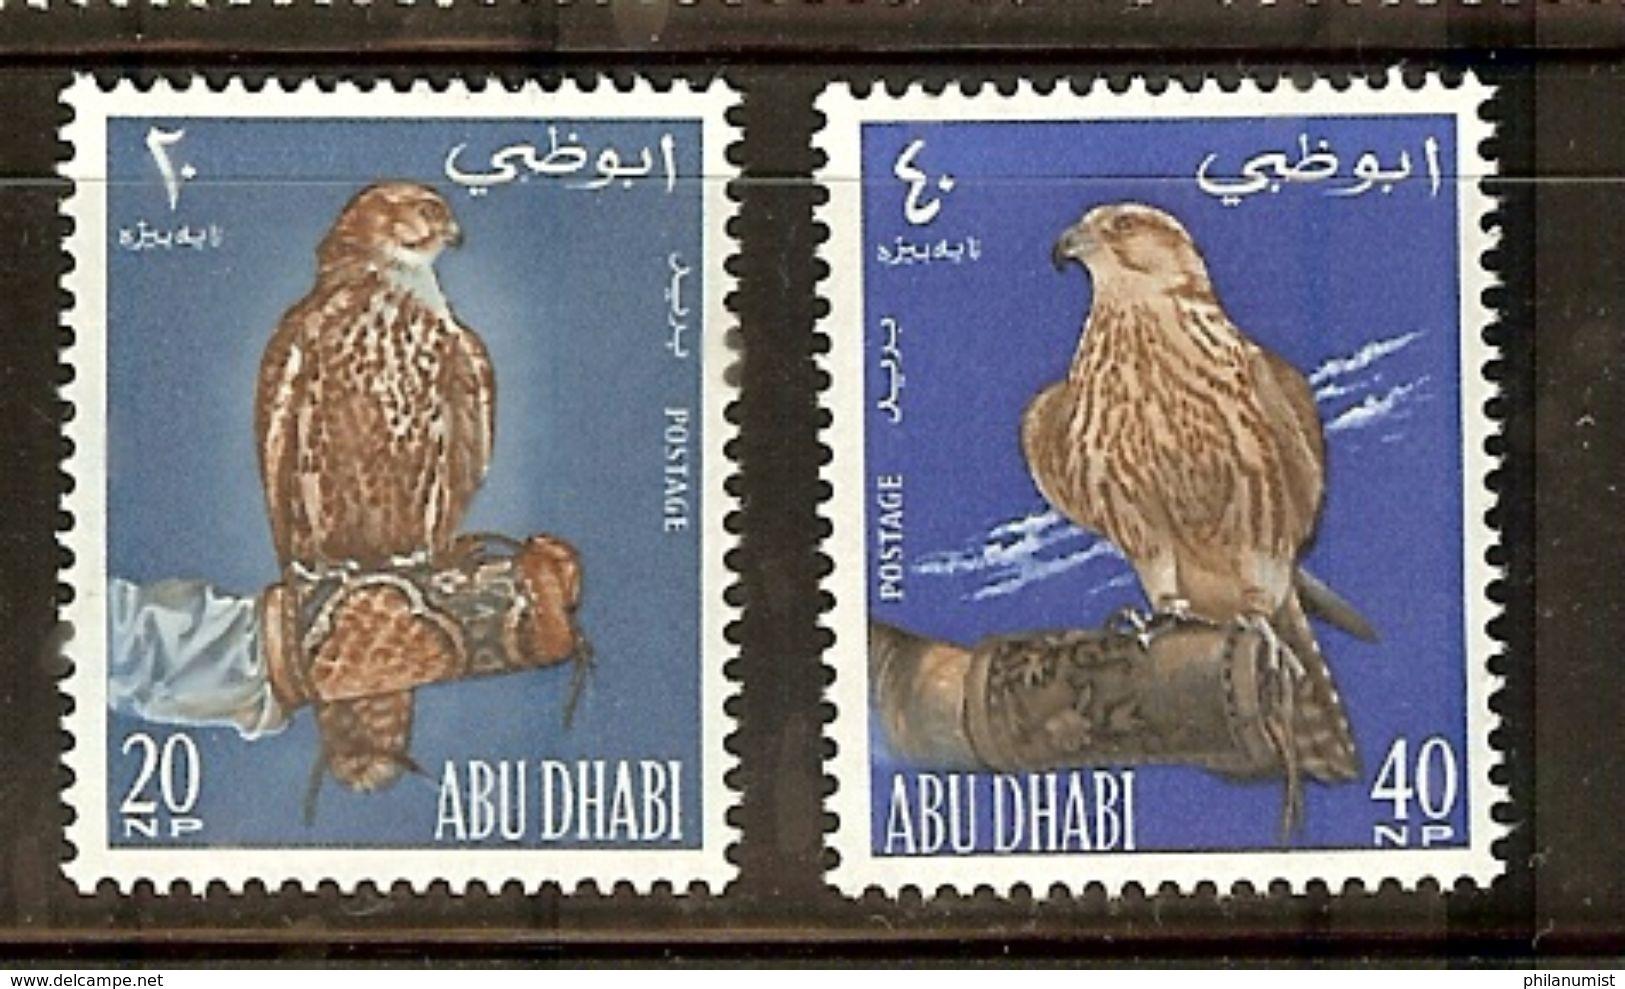 ABU DHABI BIRDS FALCON 2v 1965 MNH !! - Aigles & Rapaces Diurnes